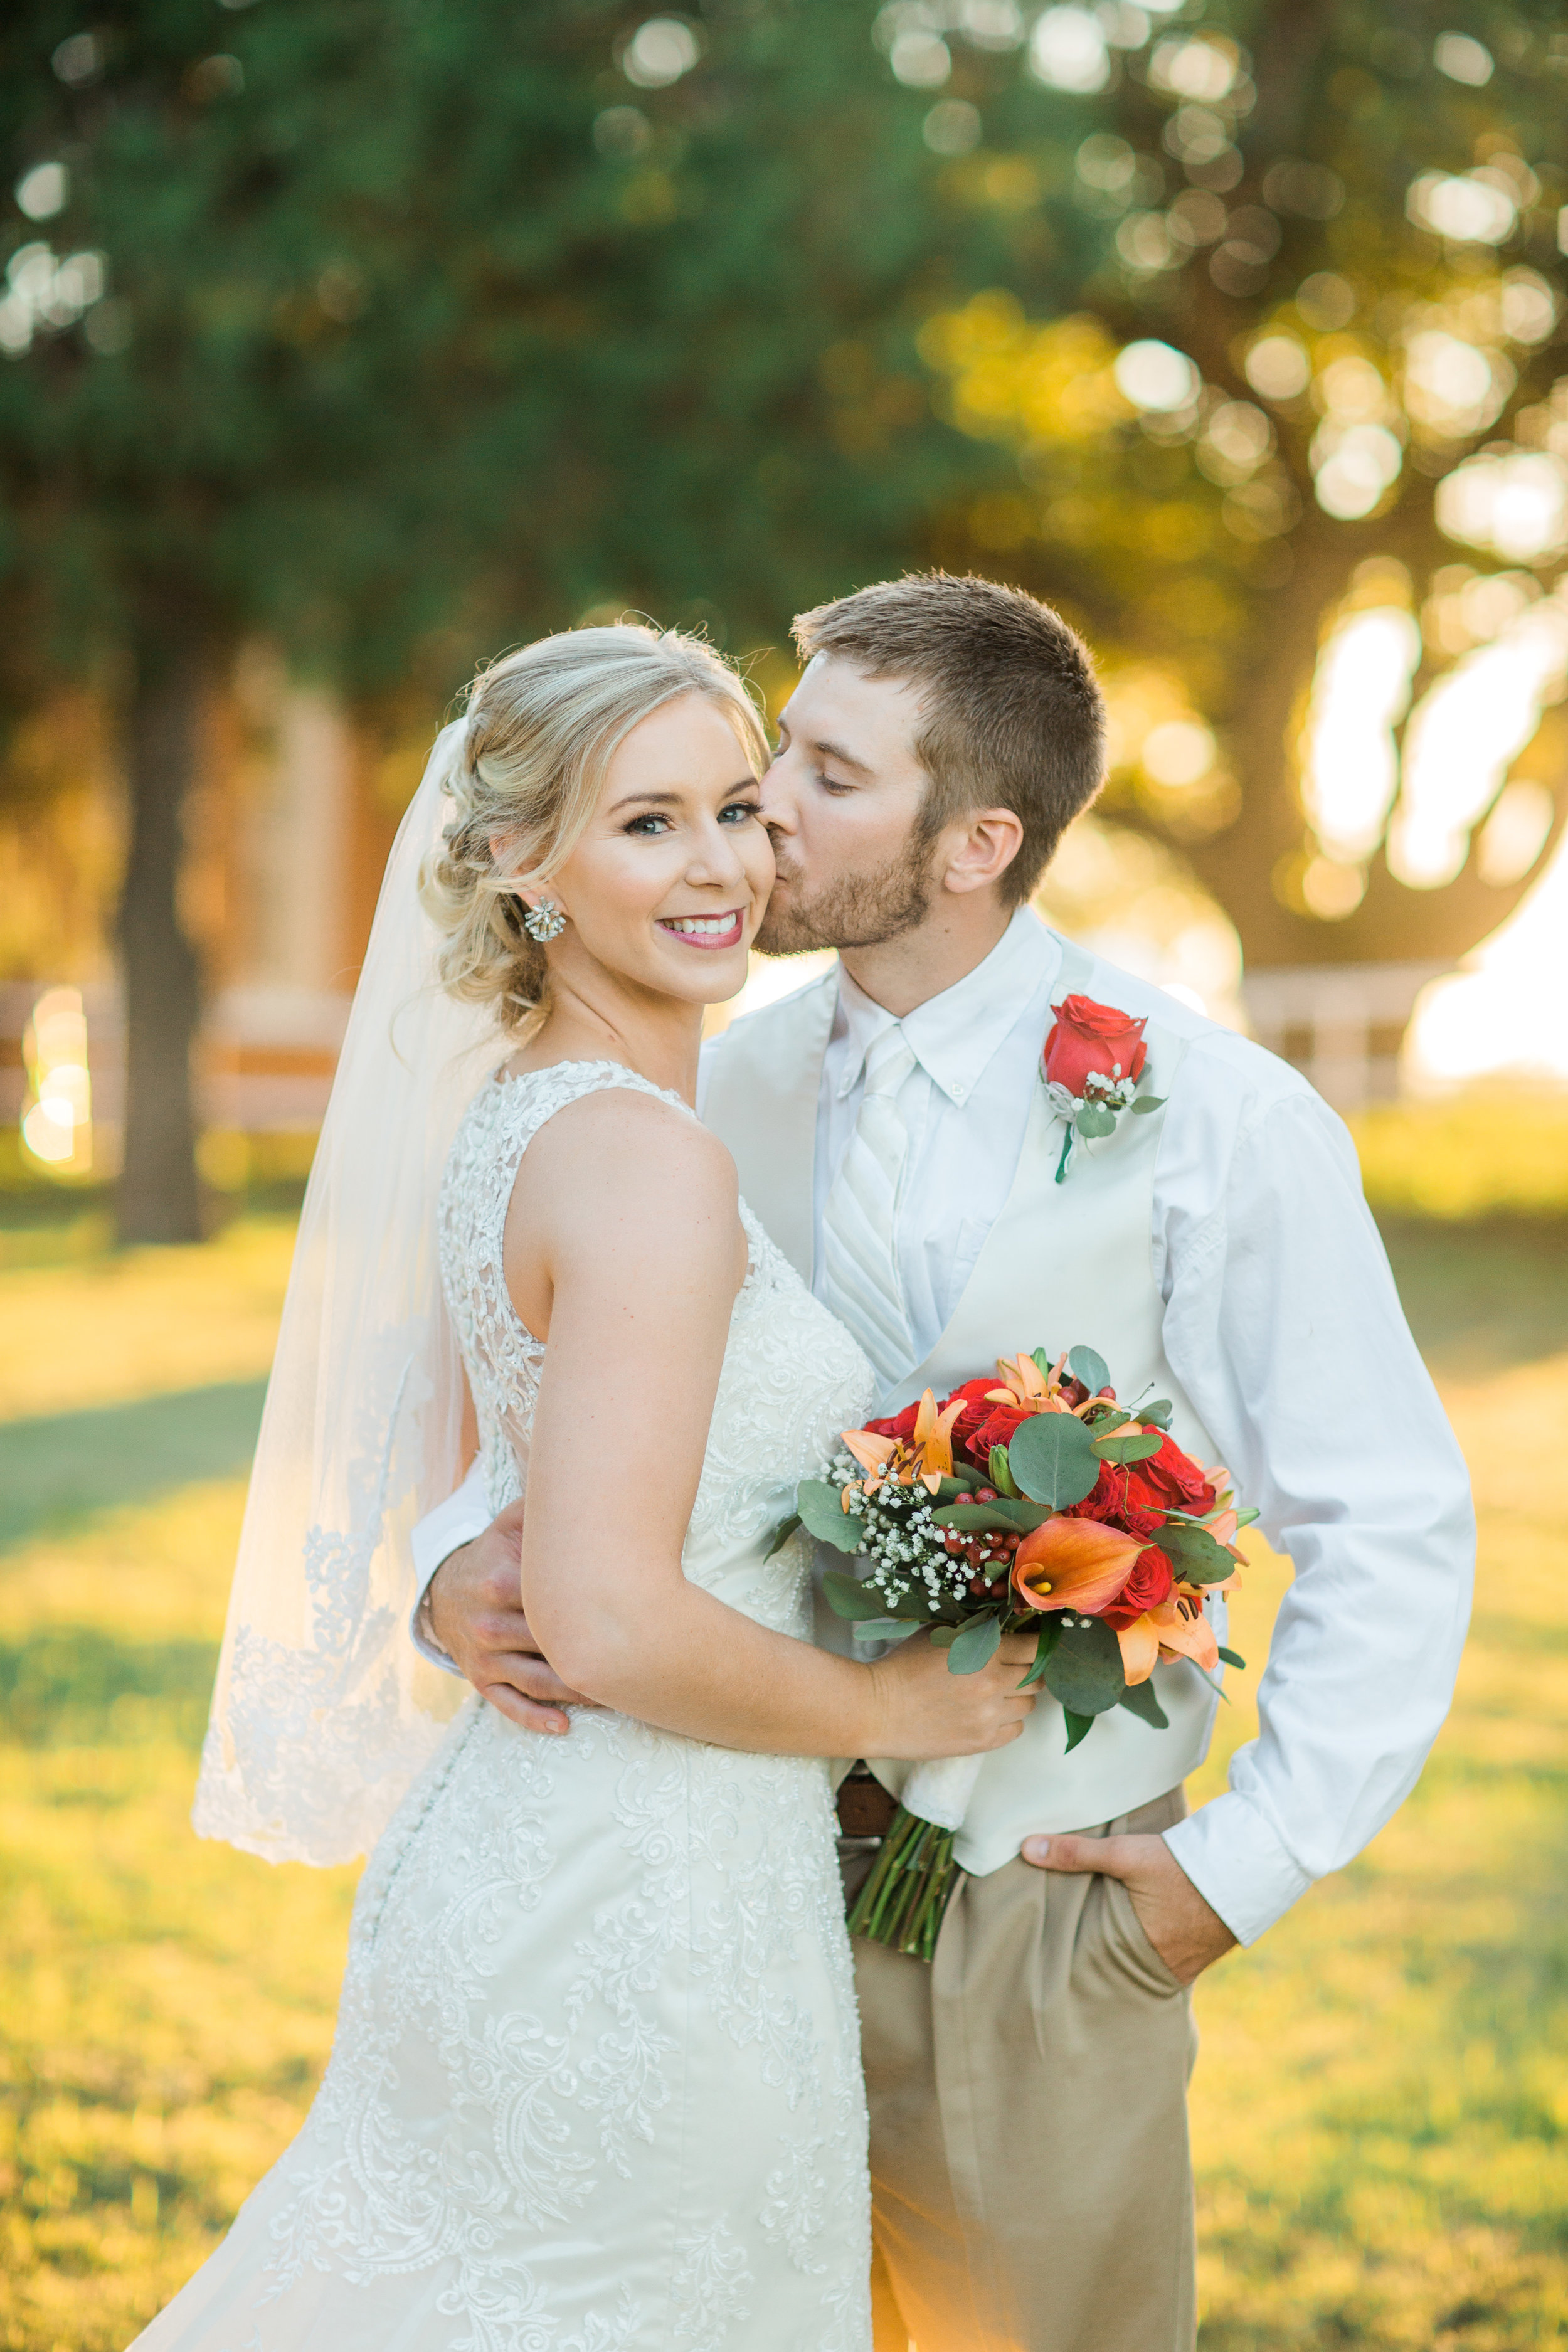 Bailey-Nathan-Windthorst-Texas-Wedding-051.jpg